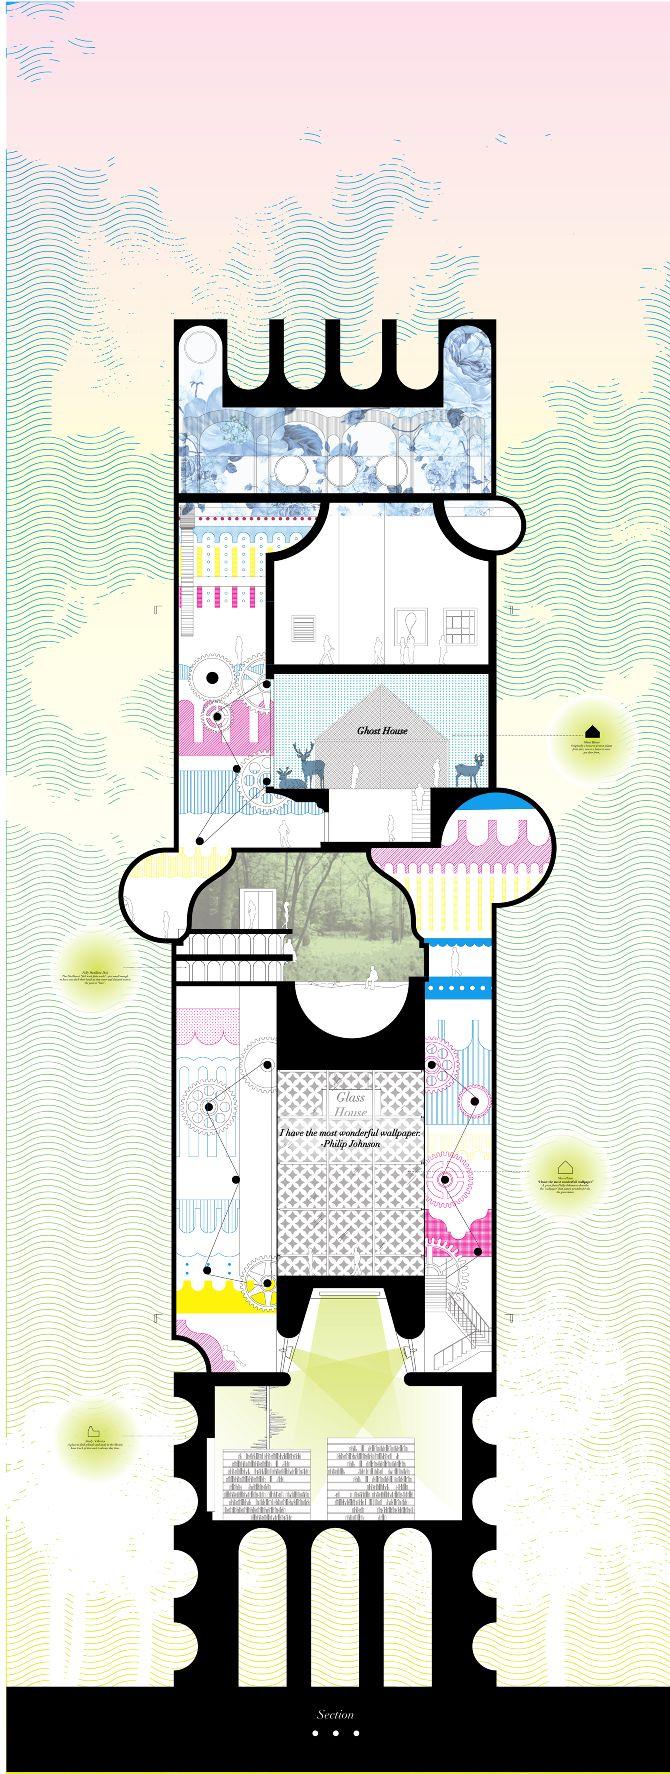 Machine for Living Fablulously - MatthewSchneider